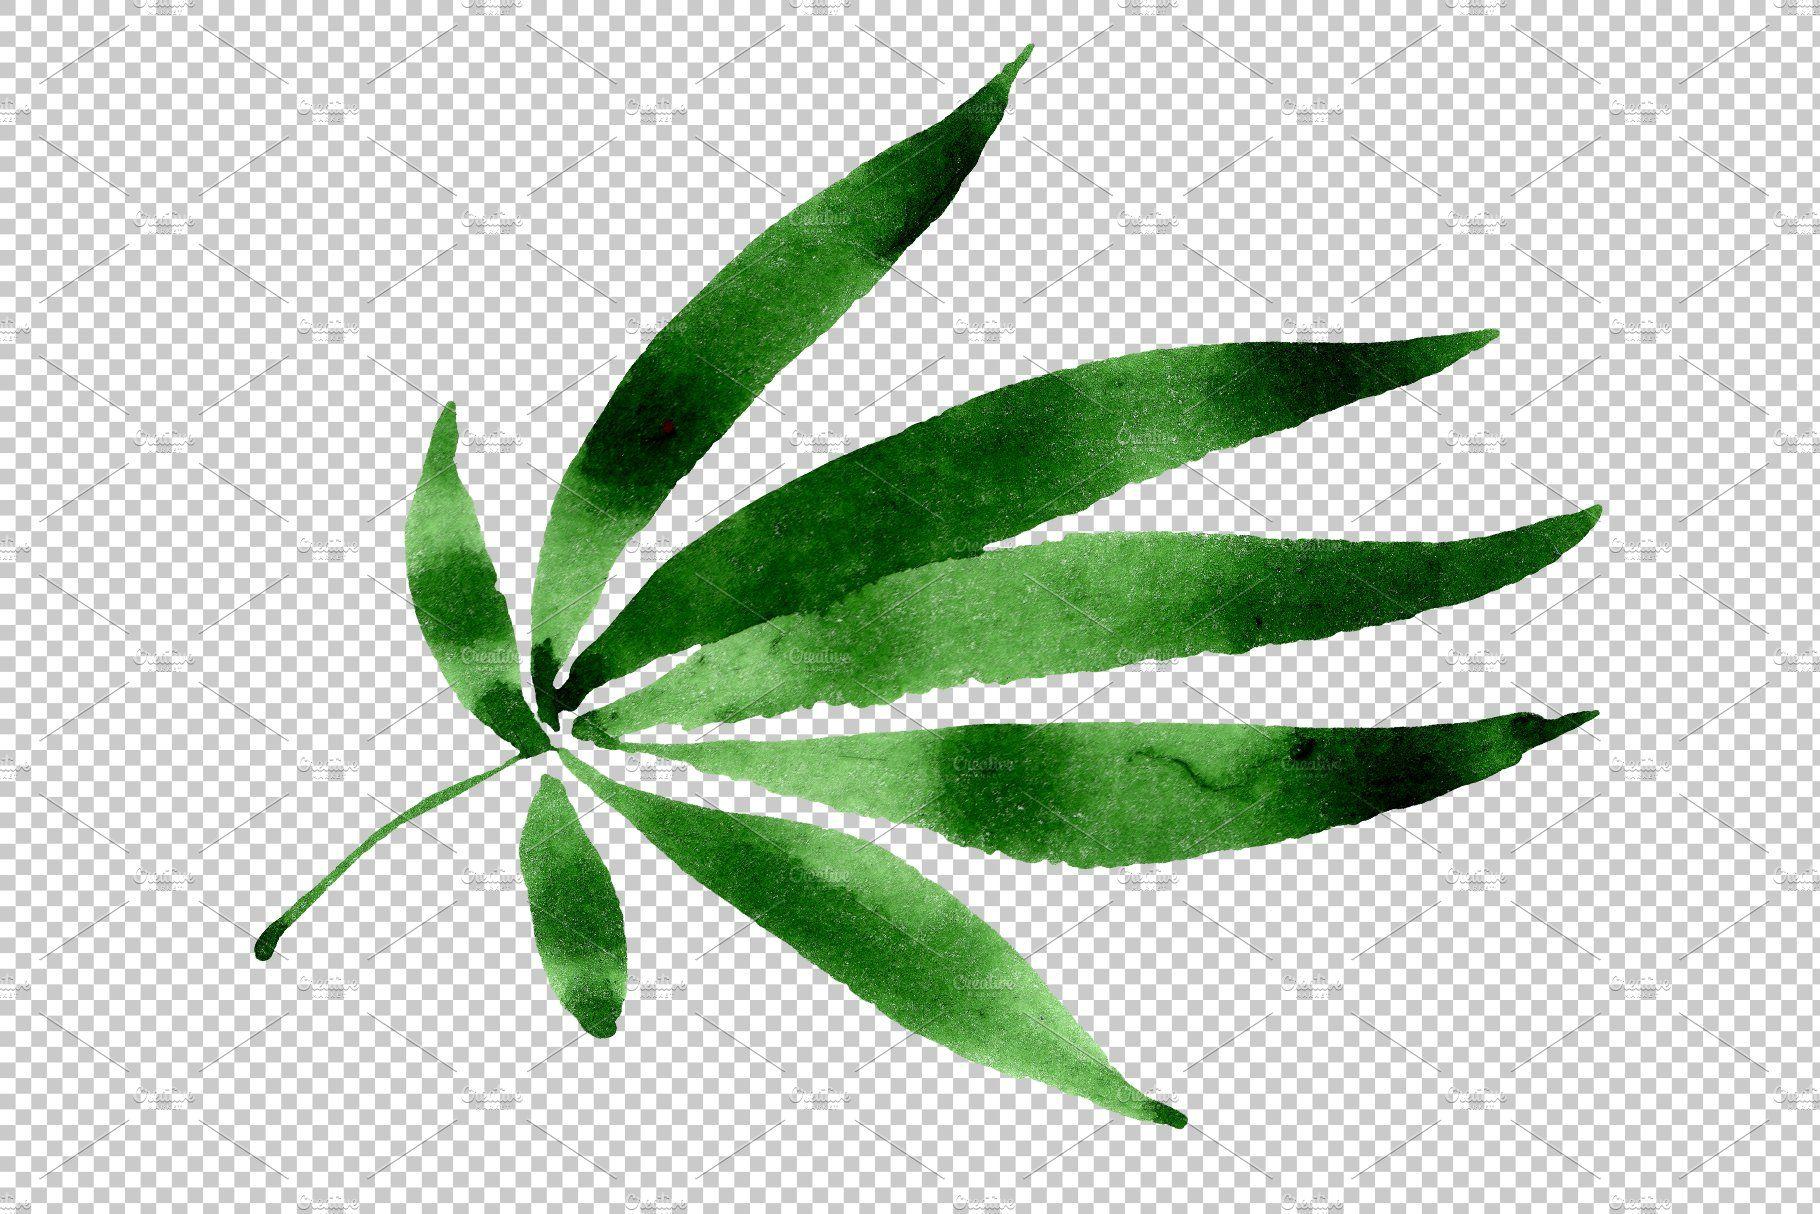 Leaves Hemp Plant Watercolor Png Watercolor Plants Plants Hemp Leaf